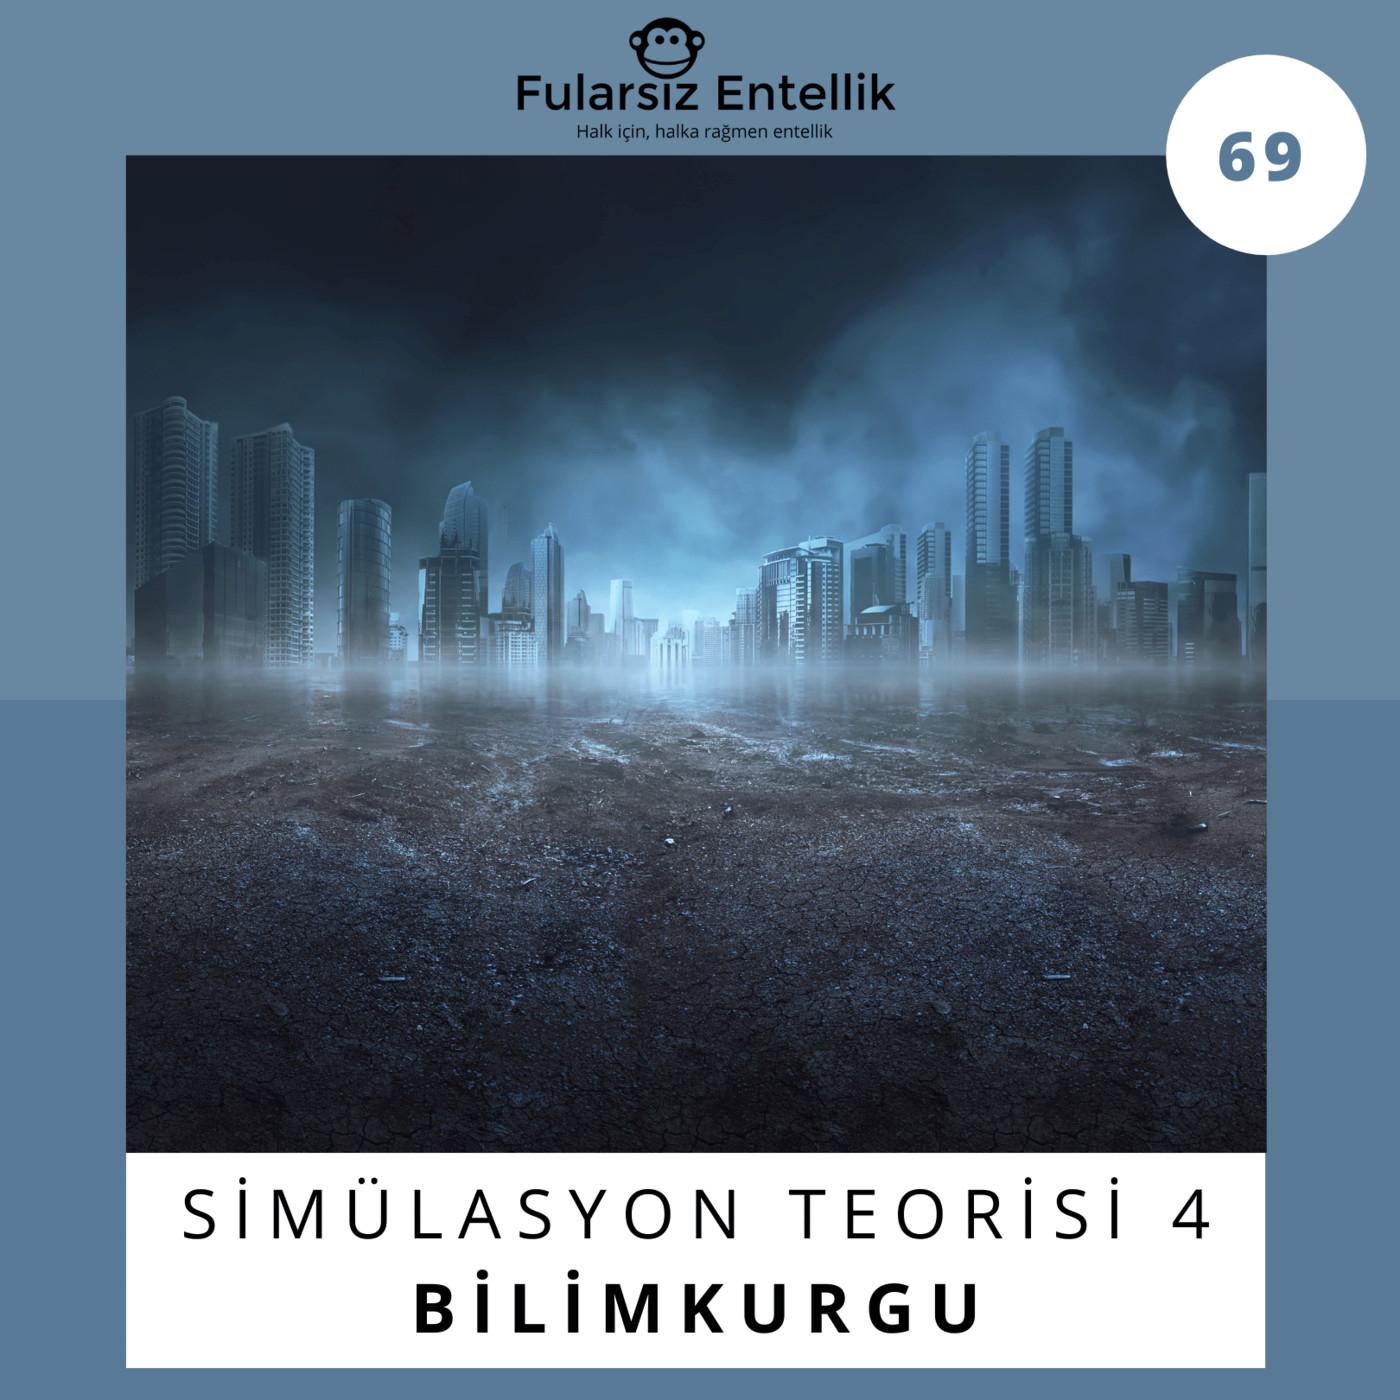 Simülasyon Teorisi 4: Bilimkurguda Simülasyon